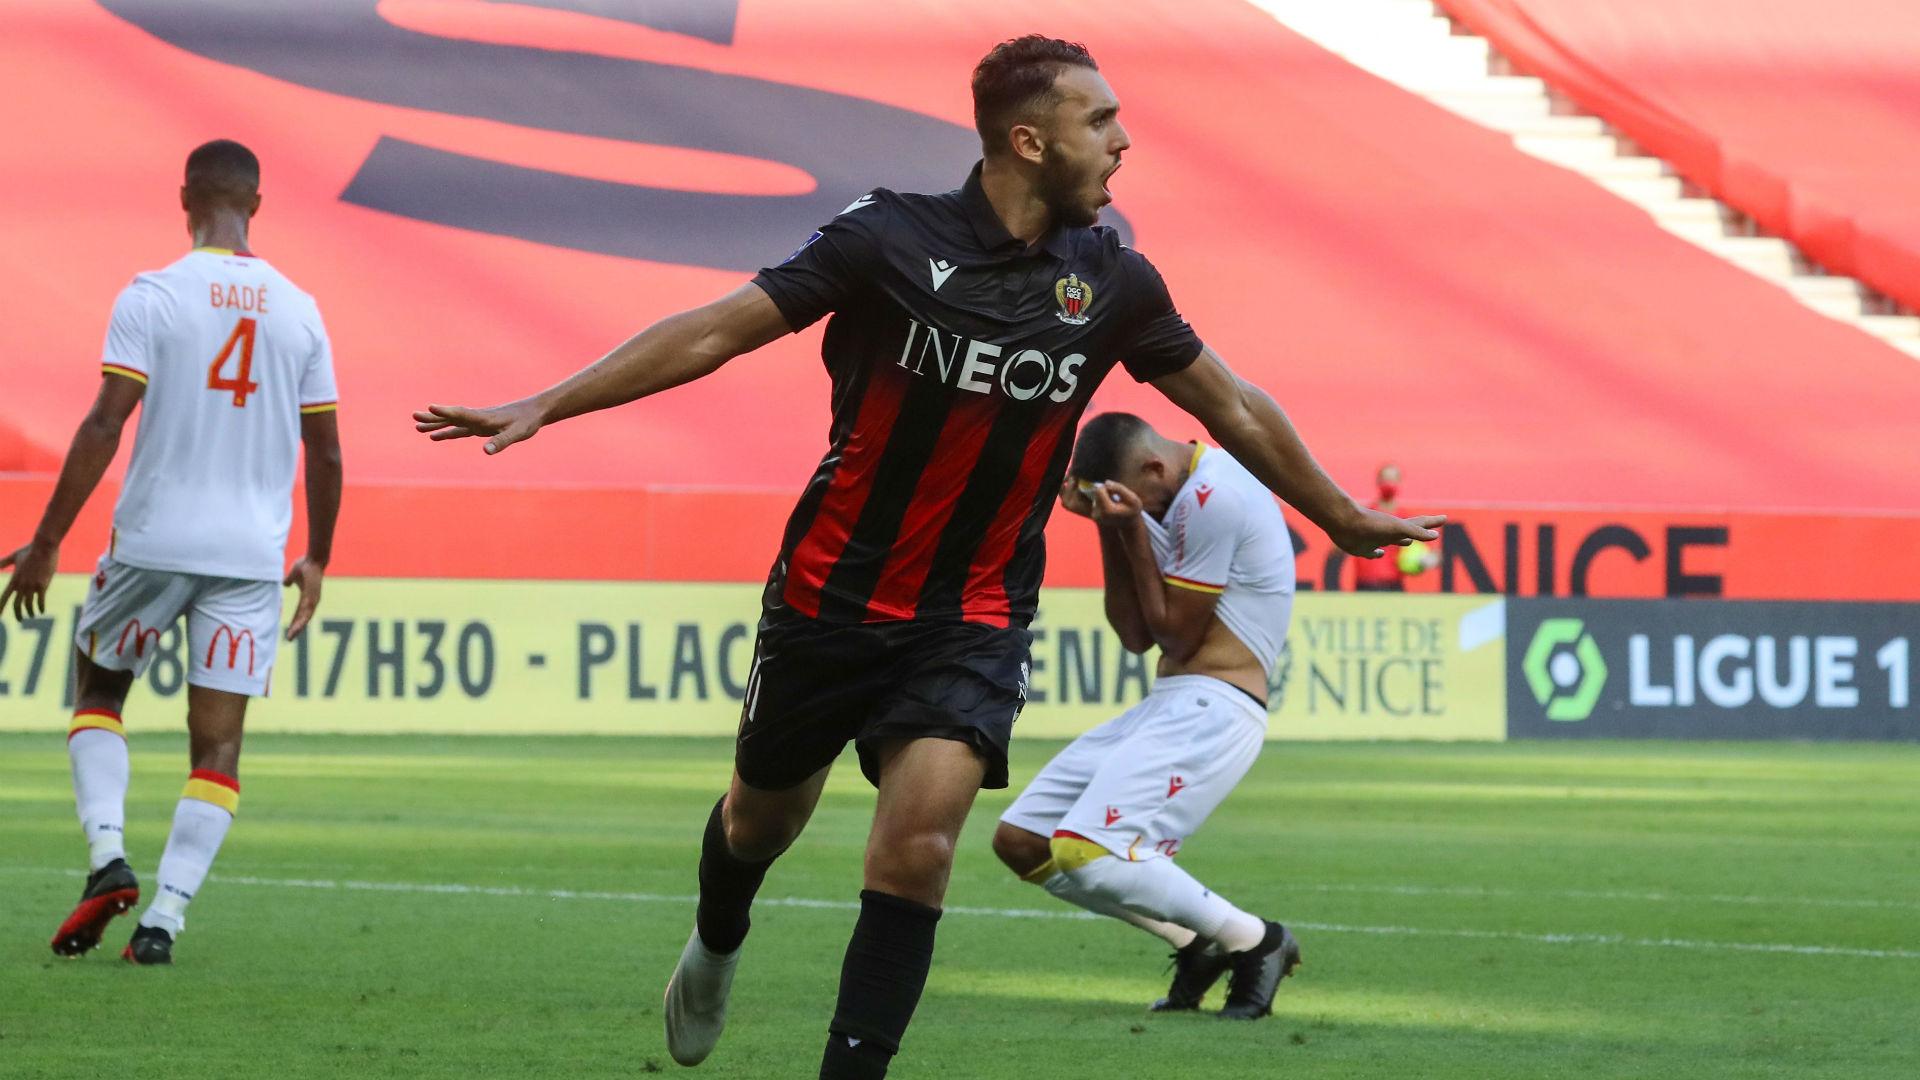 Nice will be more dangerous with Gouiri – Patrick Vieira